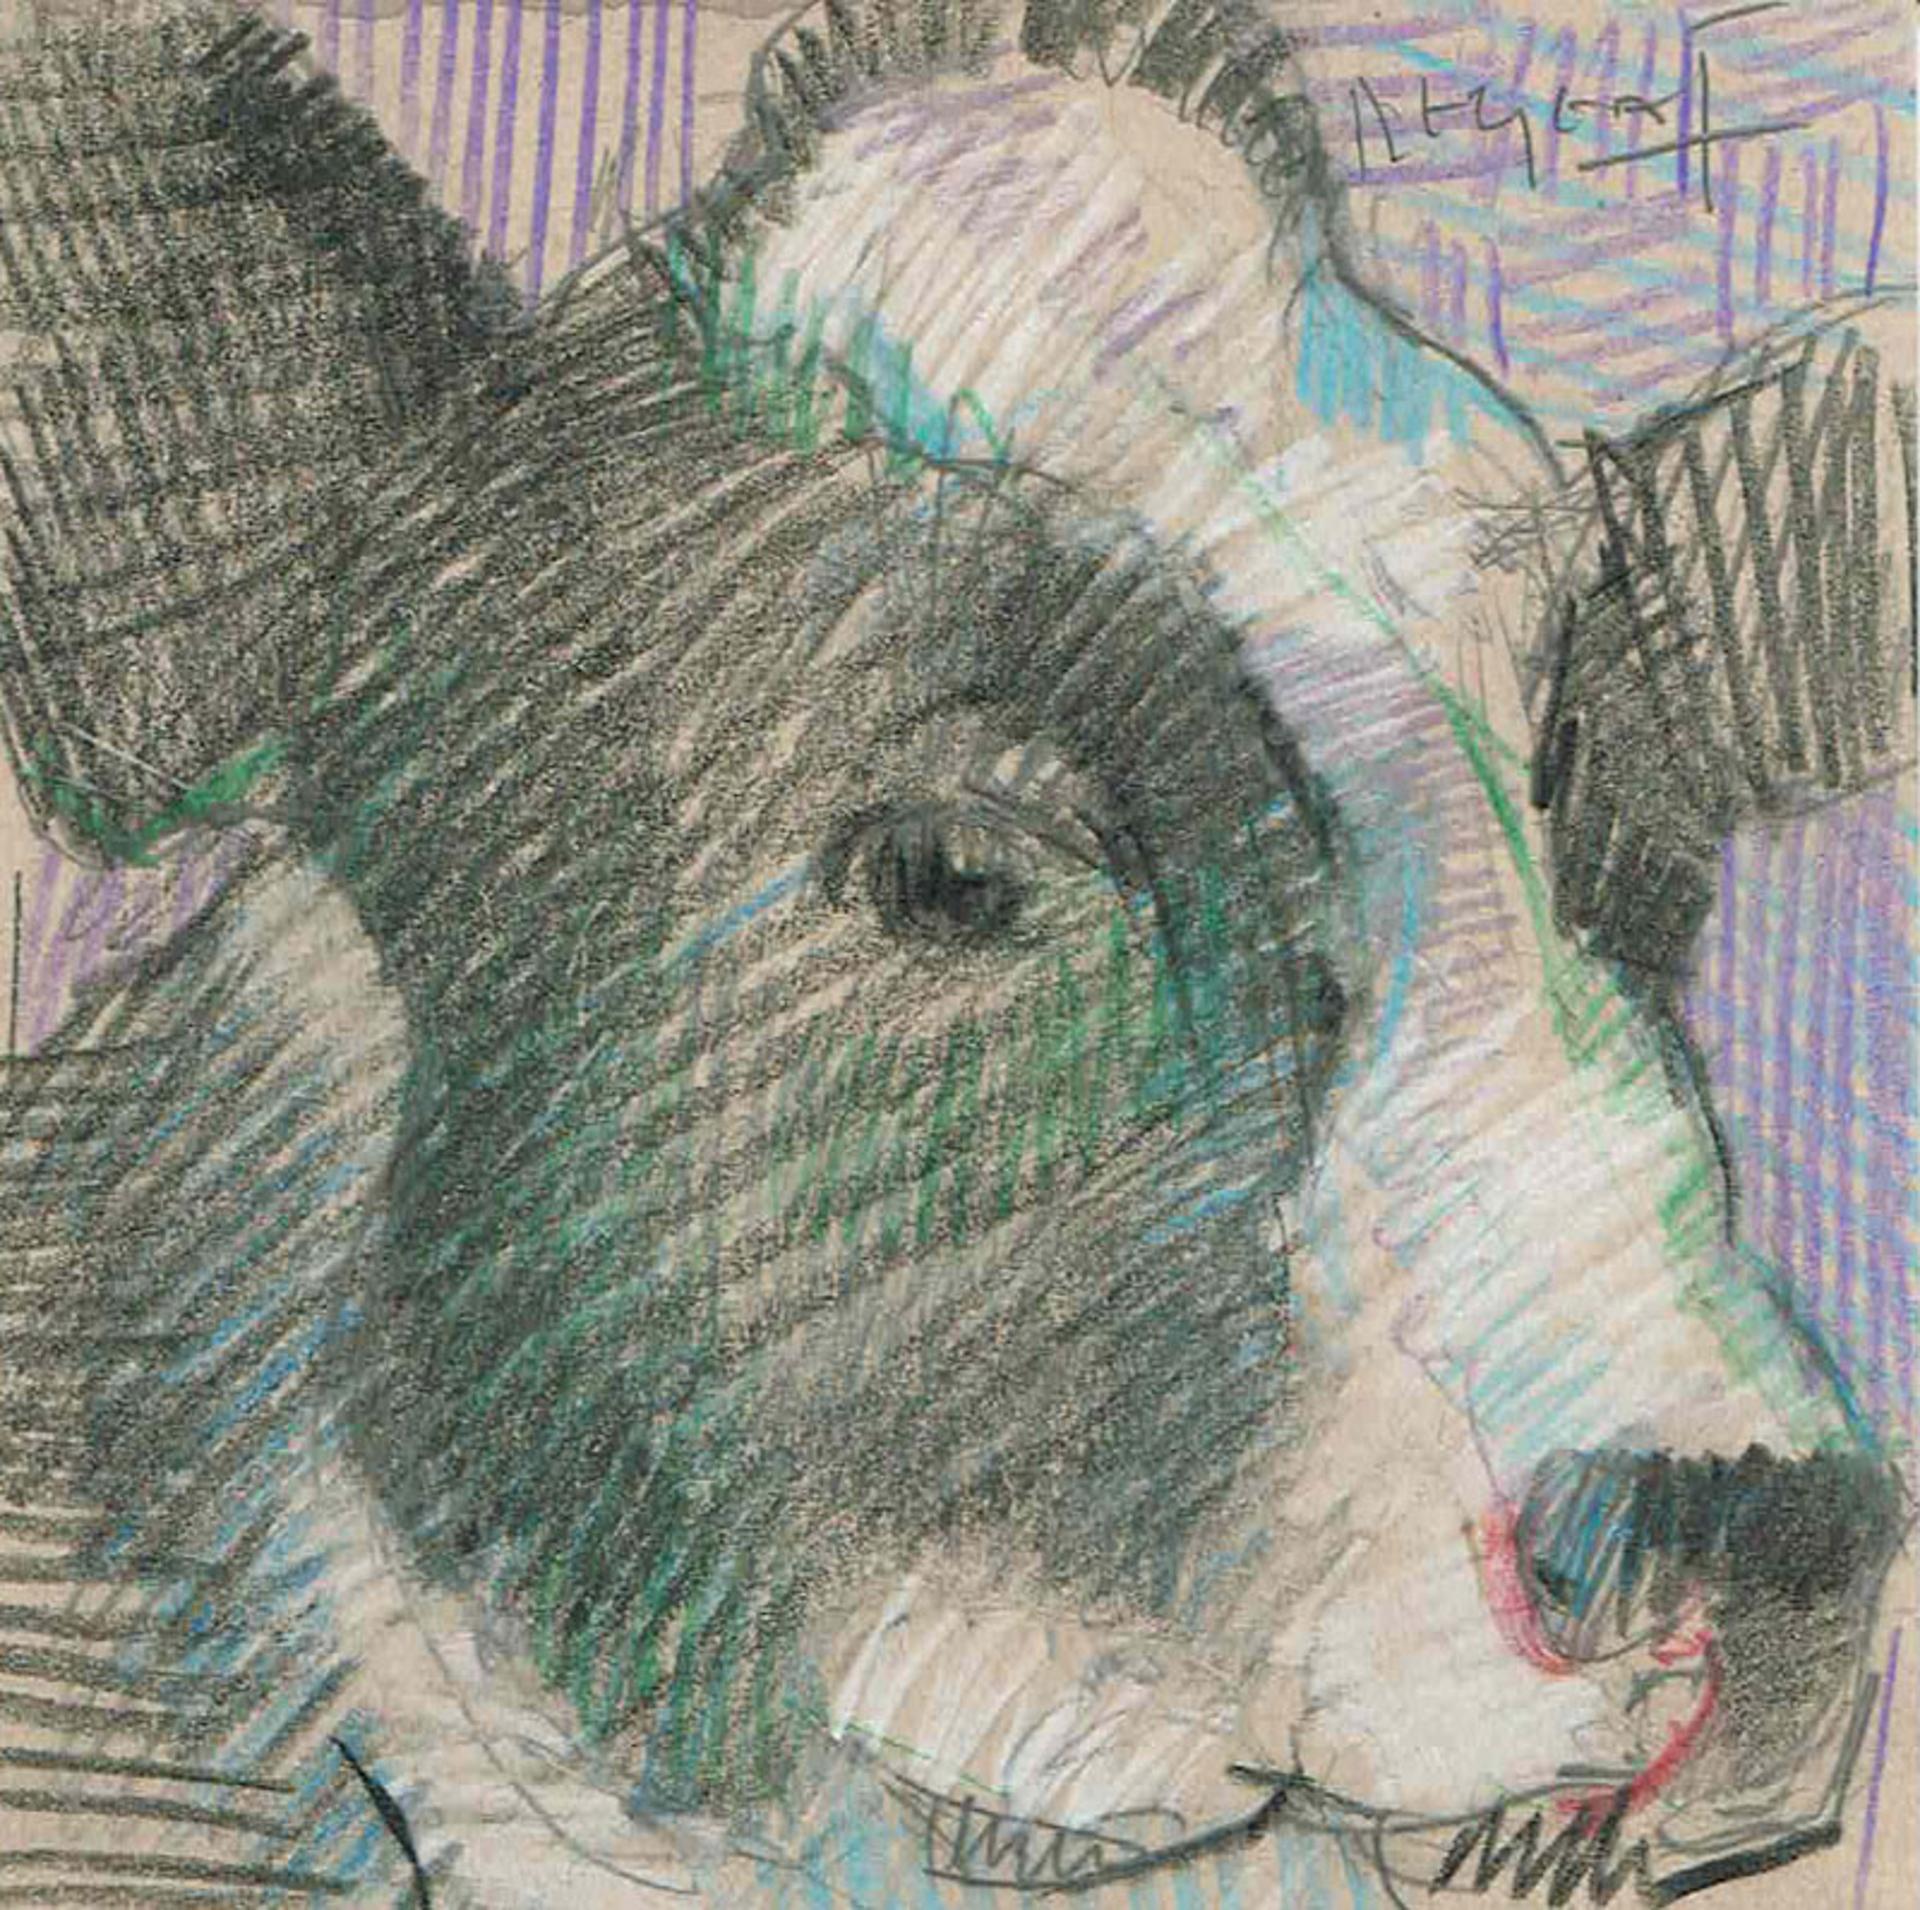 Mini Farm: Cow No. 6 by Tim Jaeger